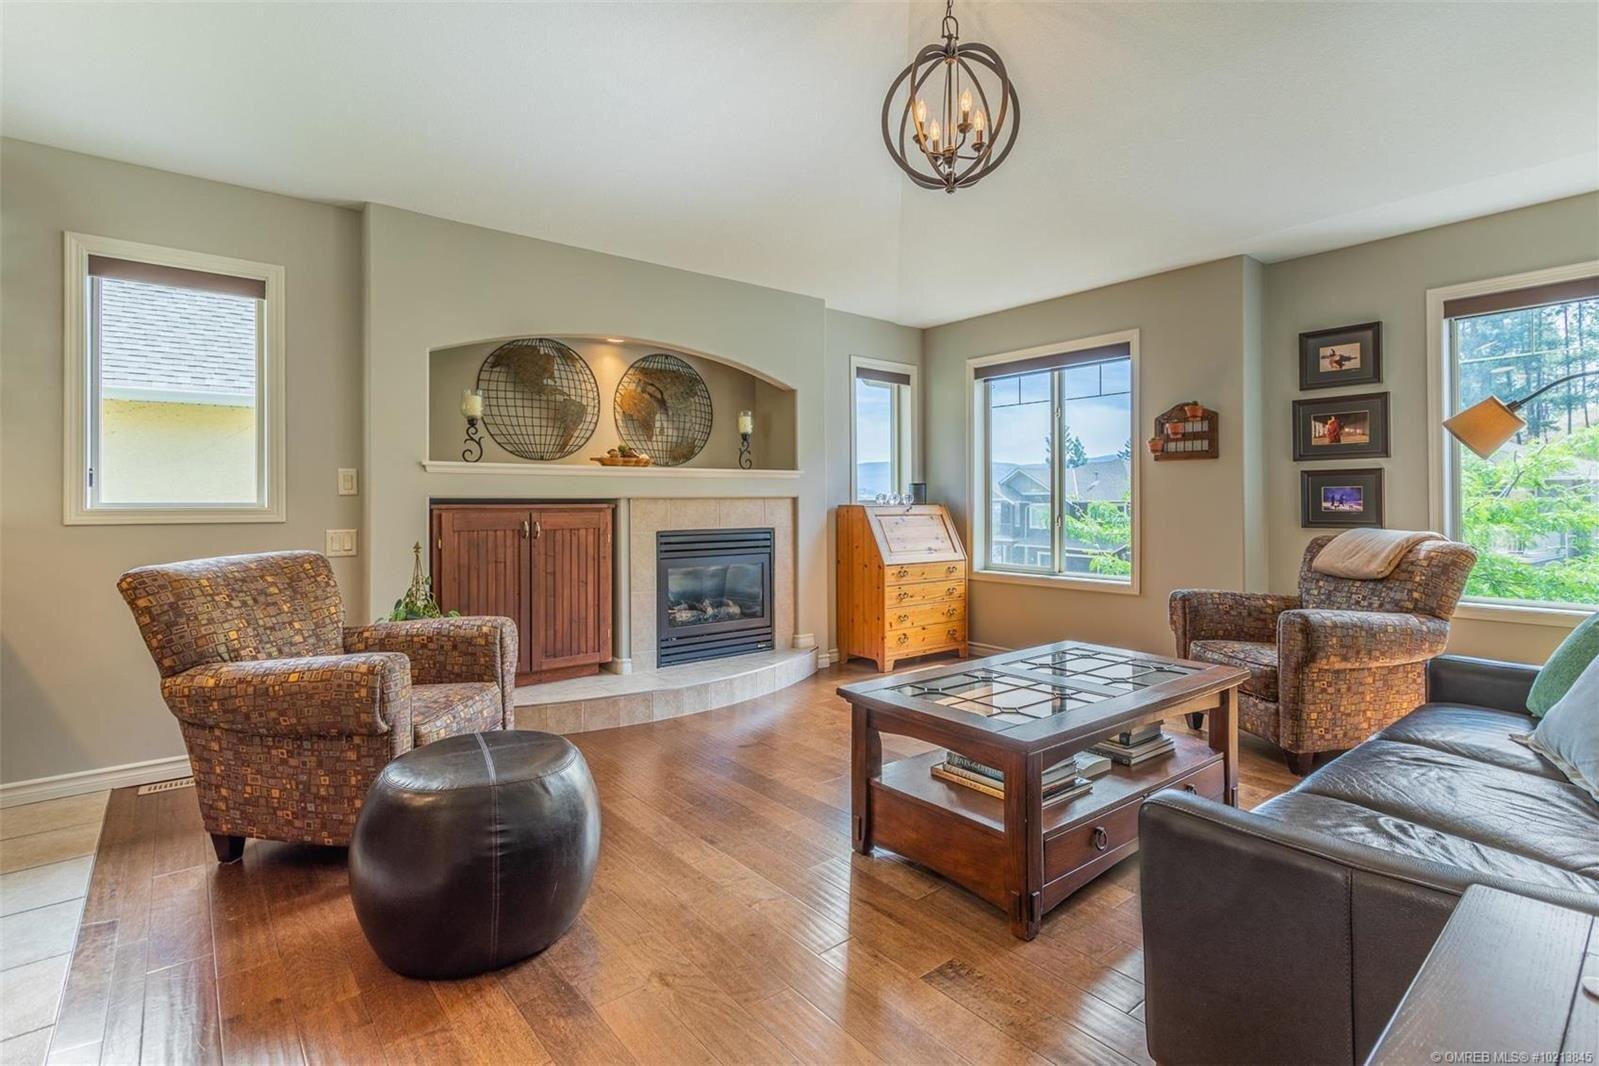 House for sale at 2356 Selkirk Dr Kelowna British Columbia - MLS: 10213845